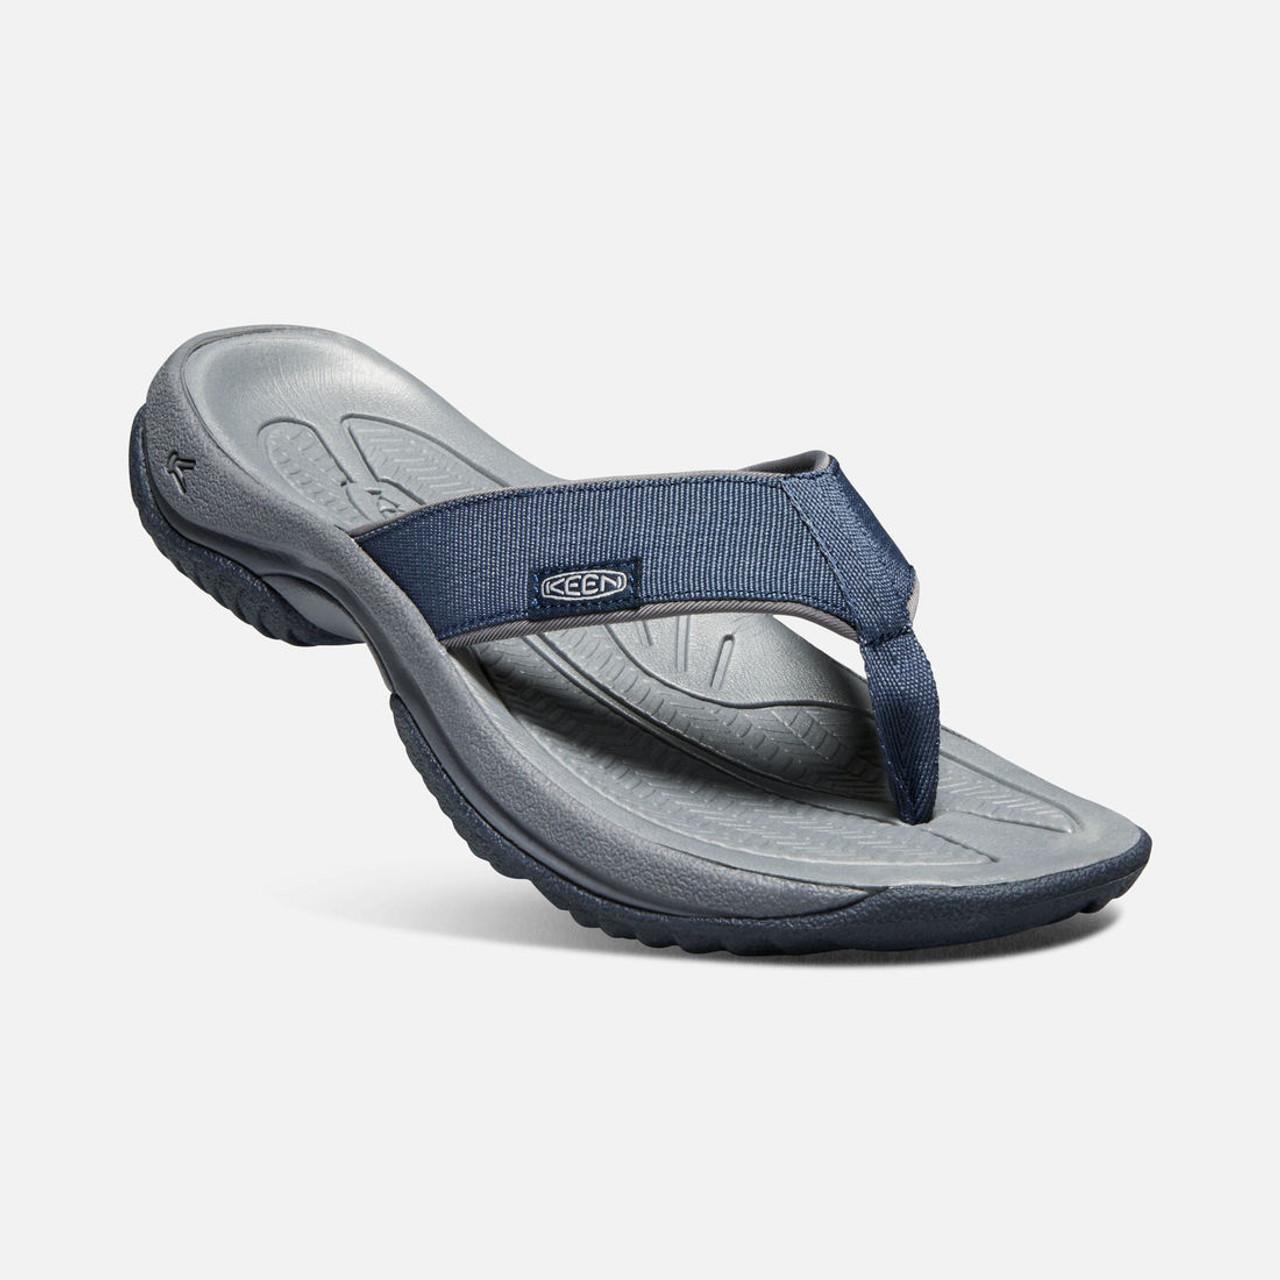 c610c207f Men s Keen Kona Flip II Sandal - Herbert s Boots and Western Wear